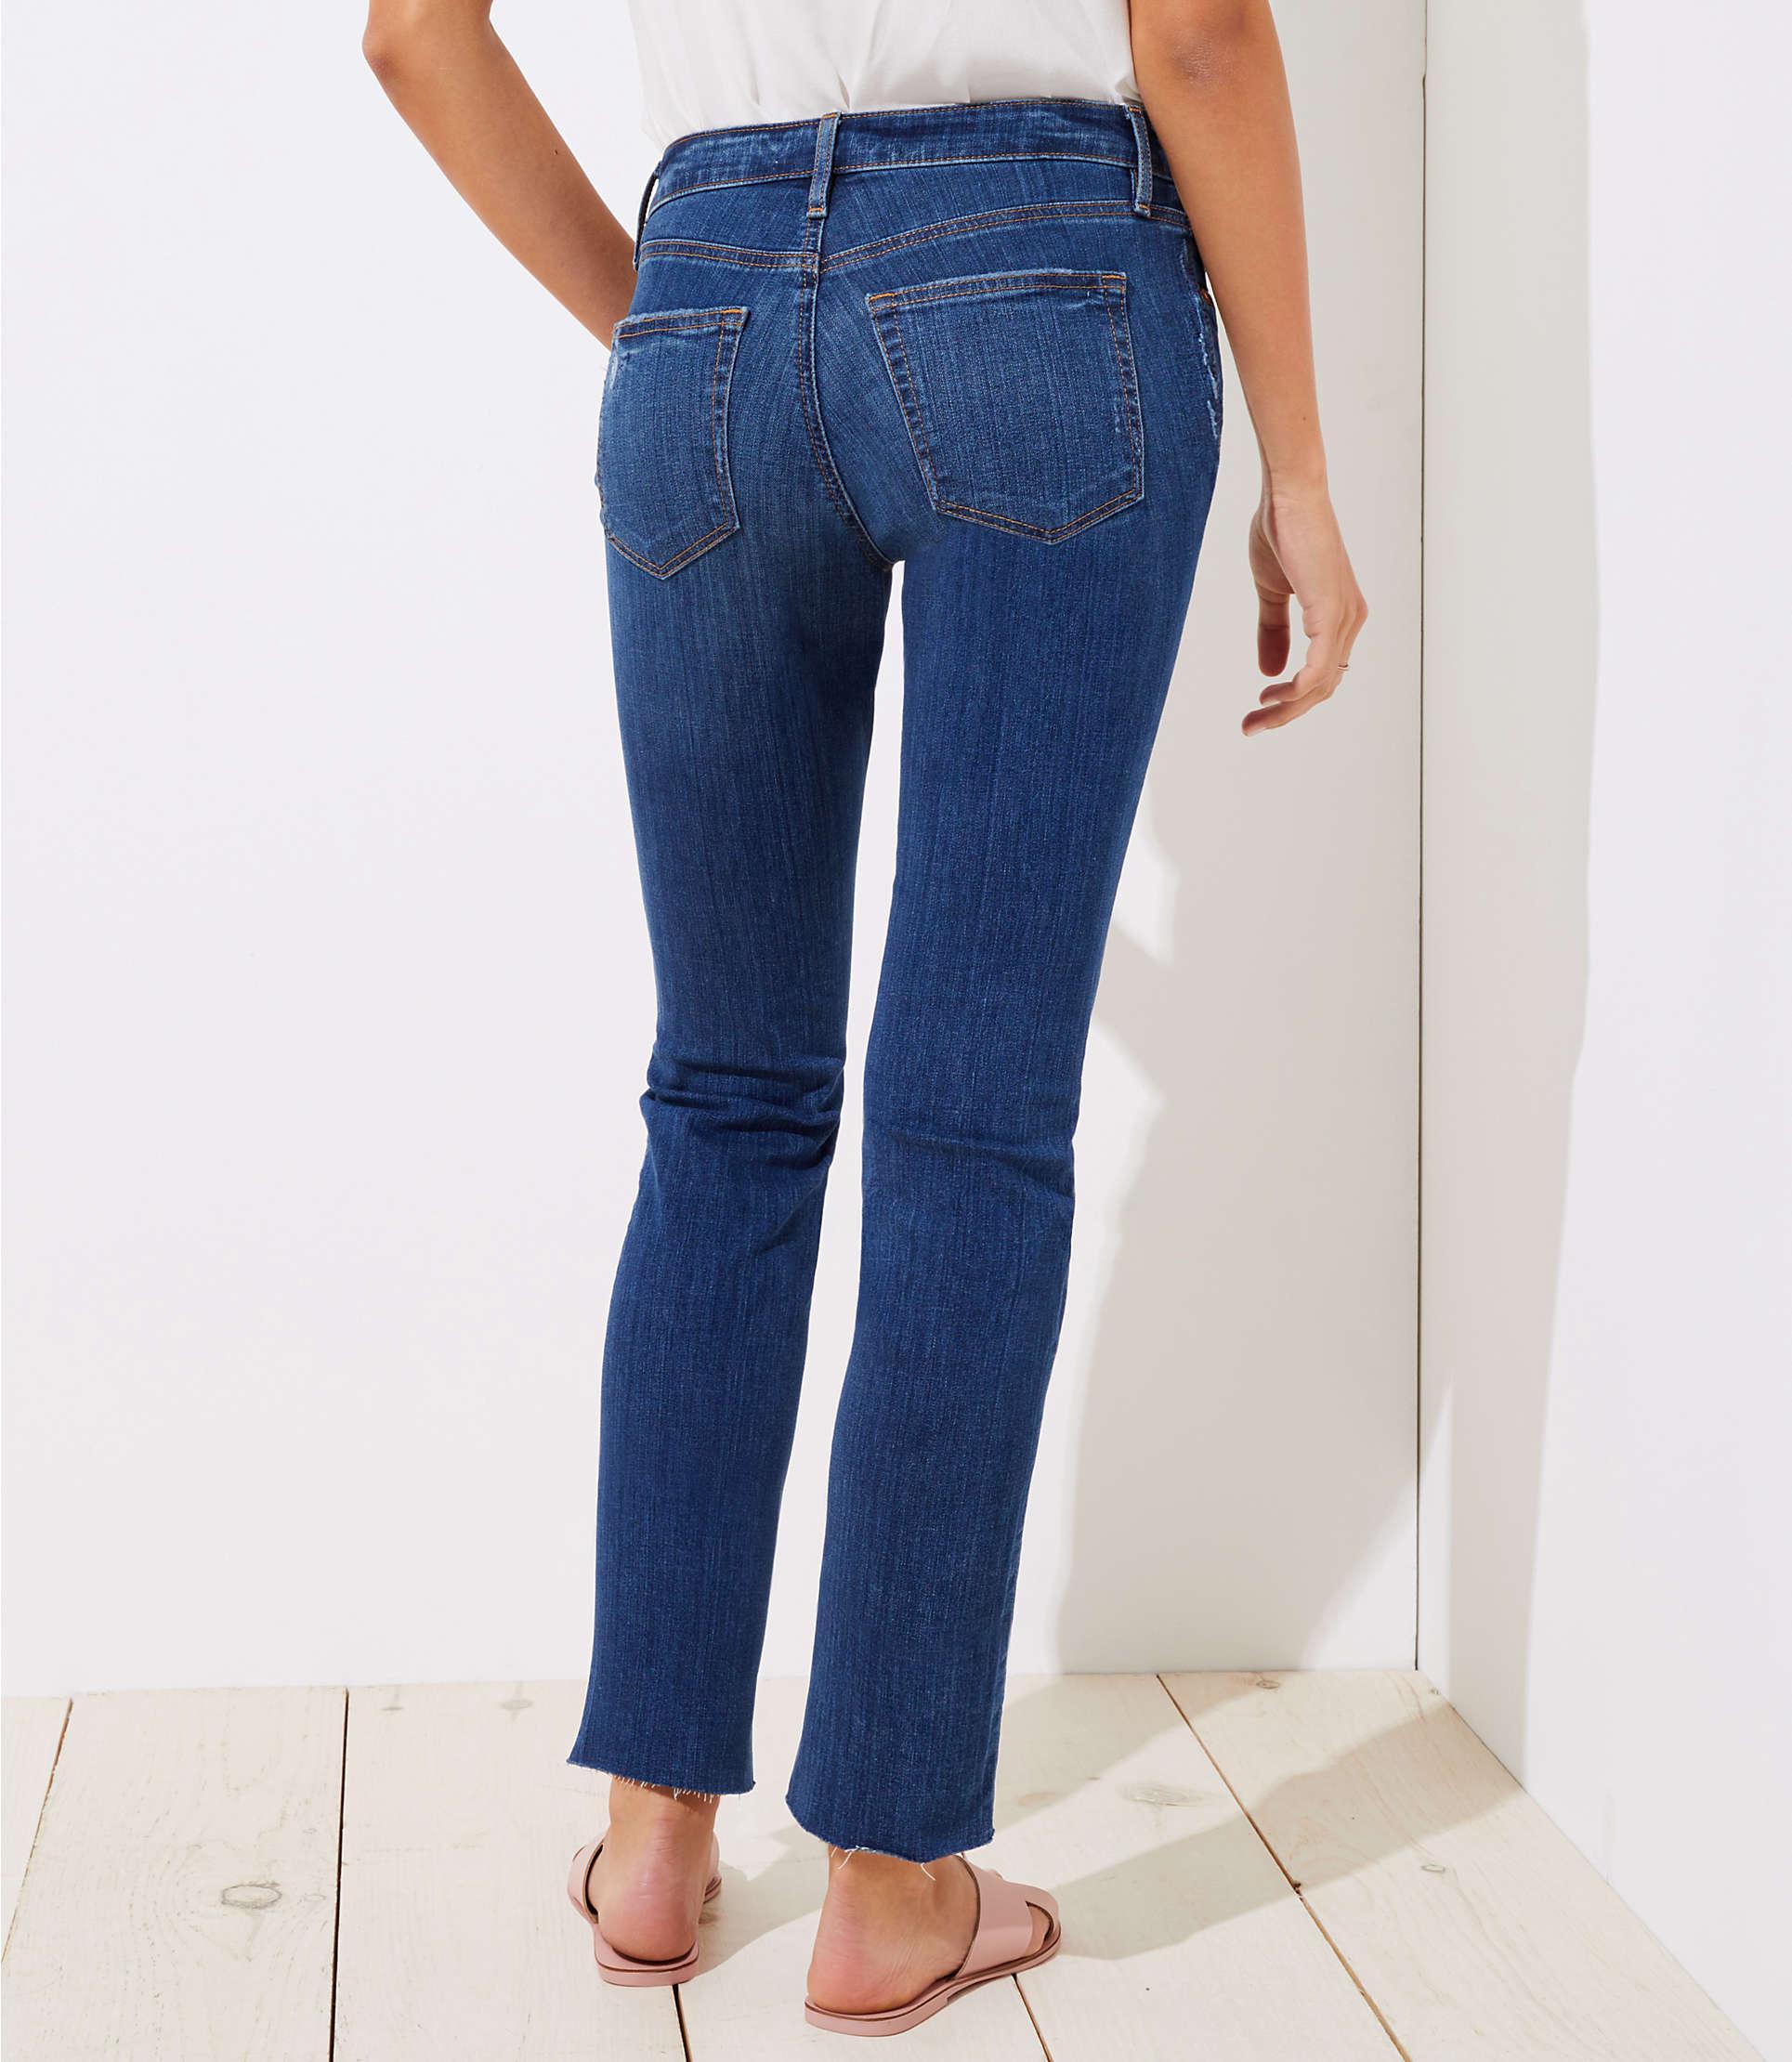 LOFT Denim Curvy Destructed Straight Leg Jeans In Mid Indigo Wash in Blue